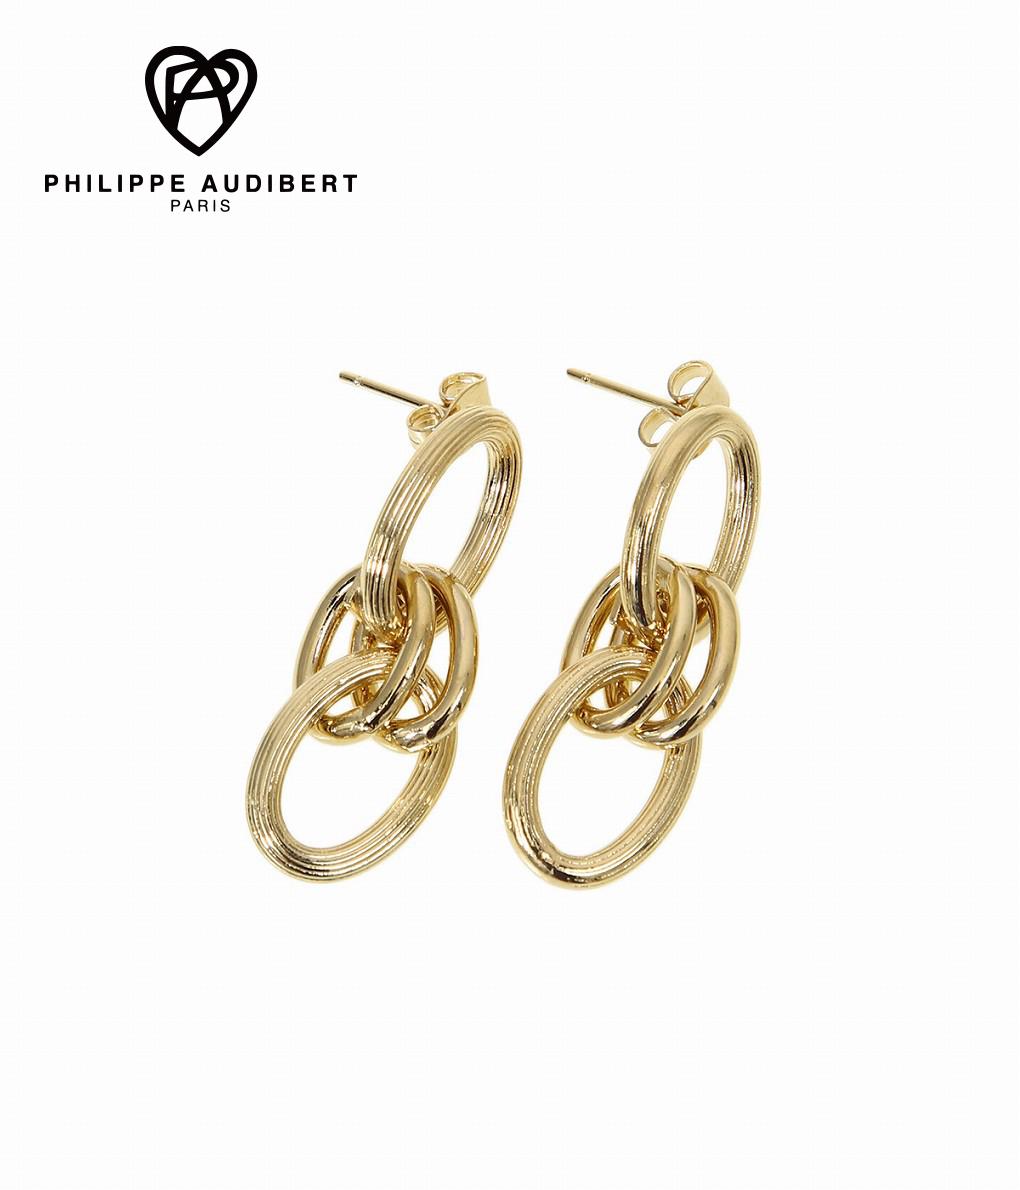 PHILIPPE AUDIBERT / フィリップオーディベール : Byron pm earring S brass(light gold) : イヤリング ピアス ゴールドカラー レディース : BO4615-GOLD【ANN】